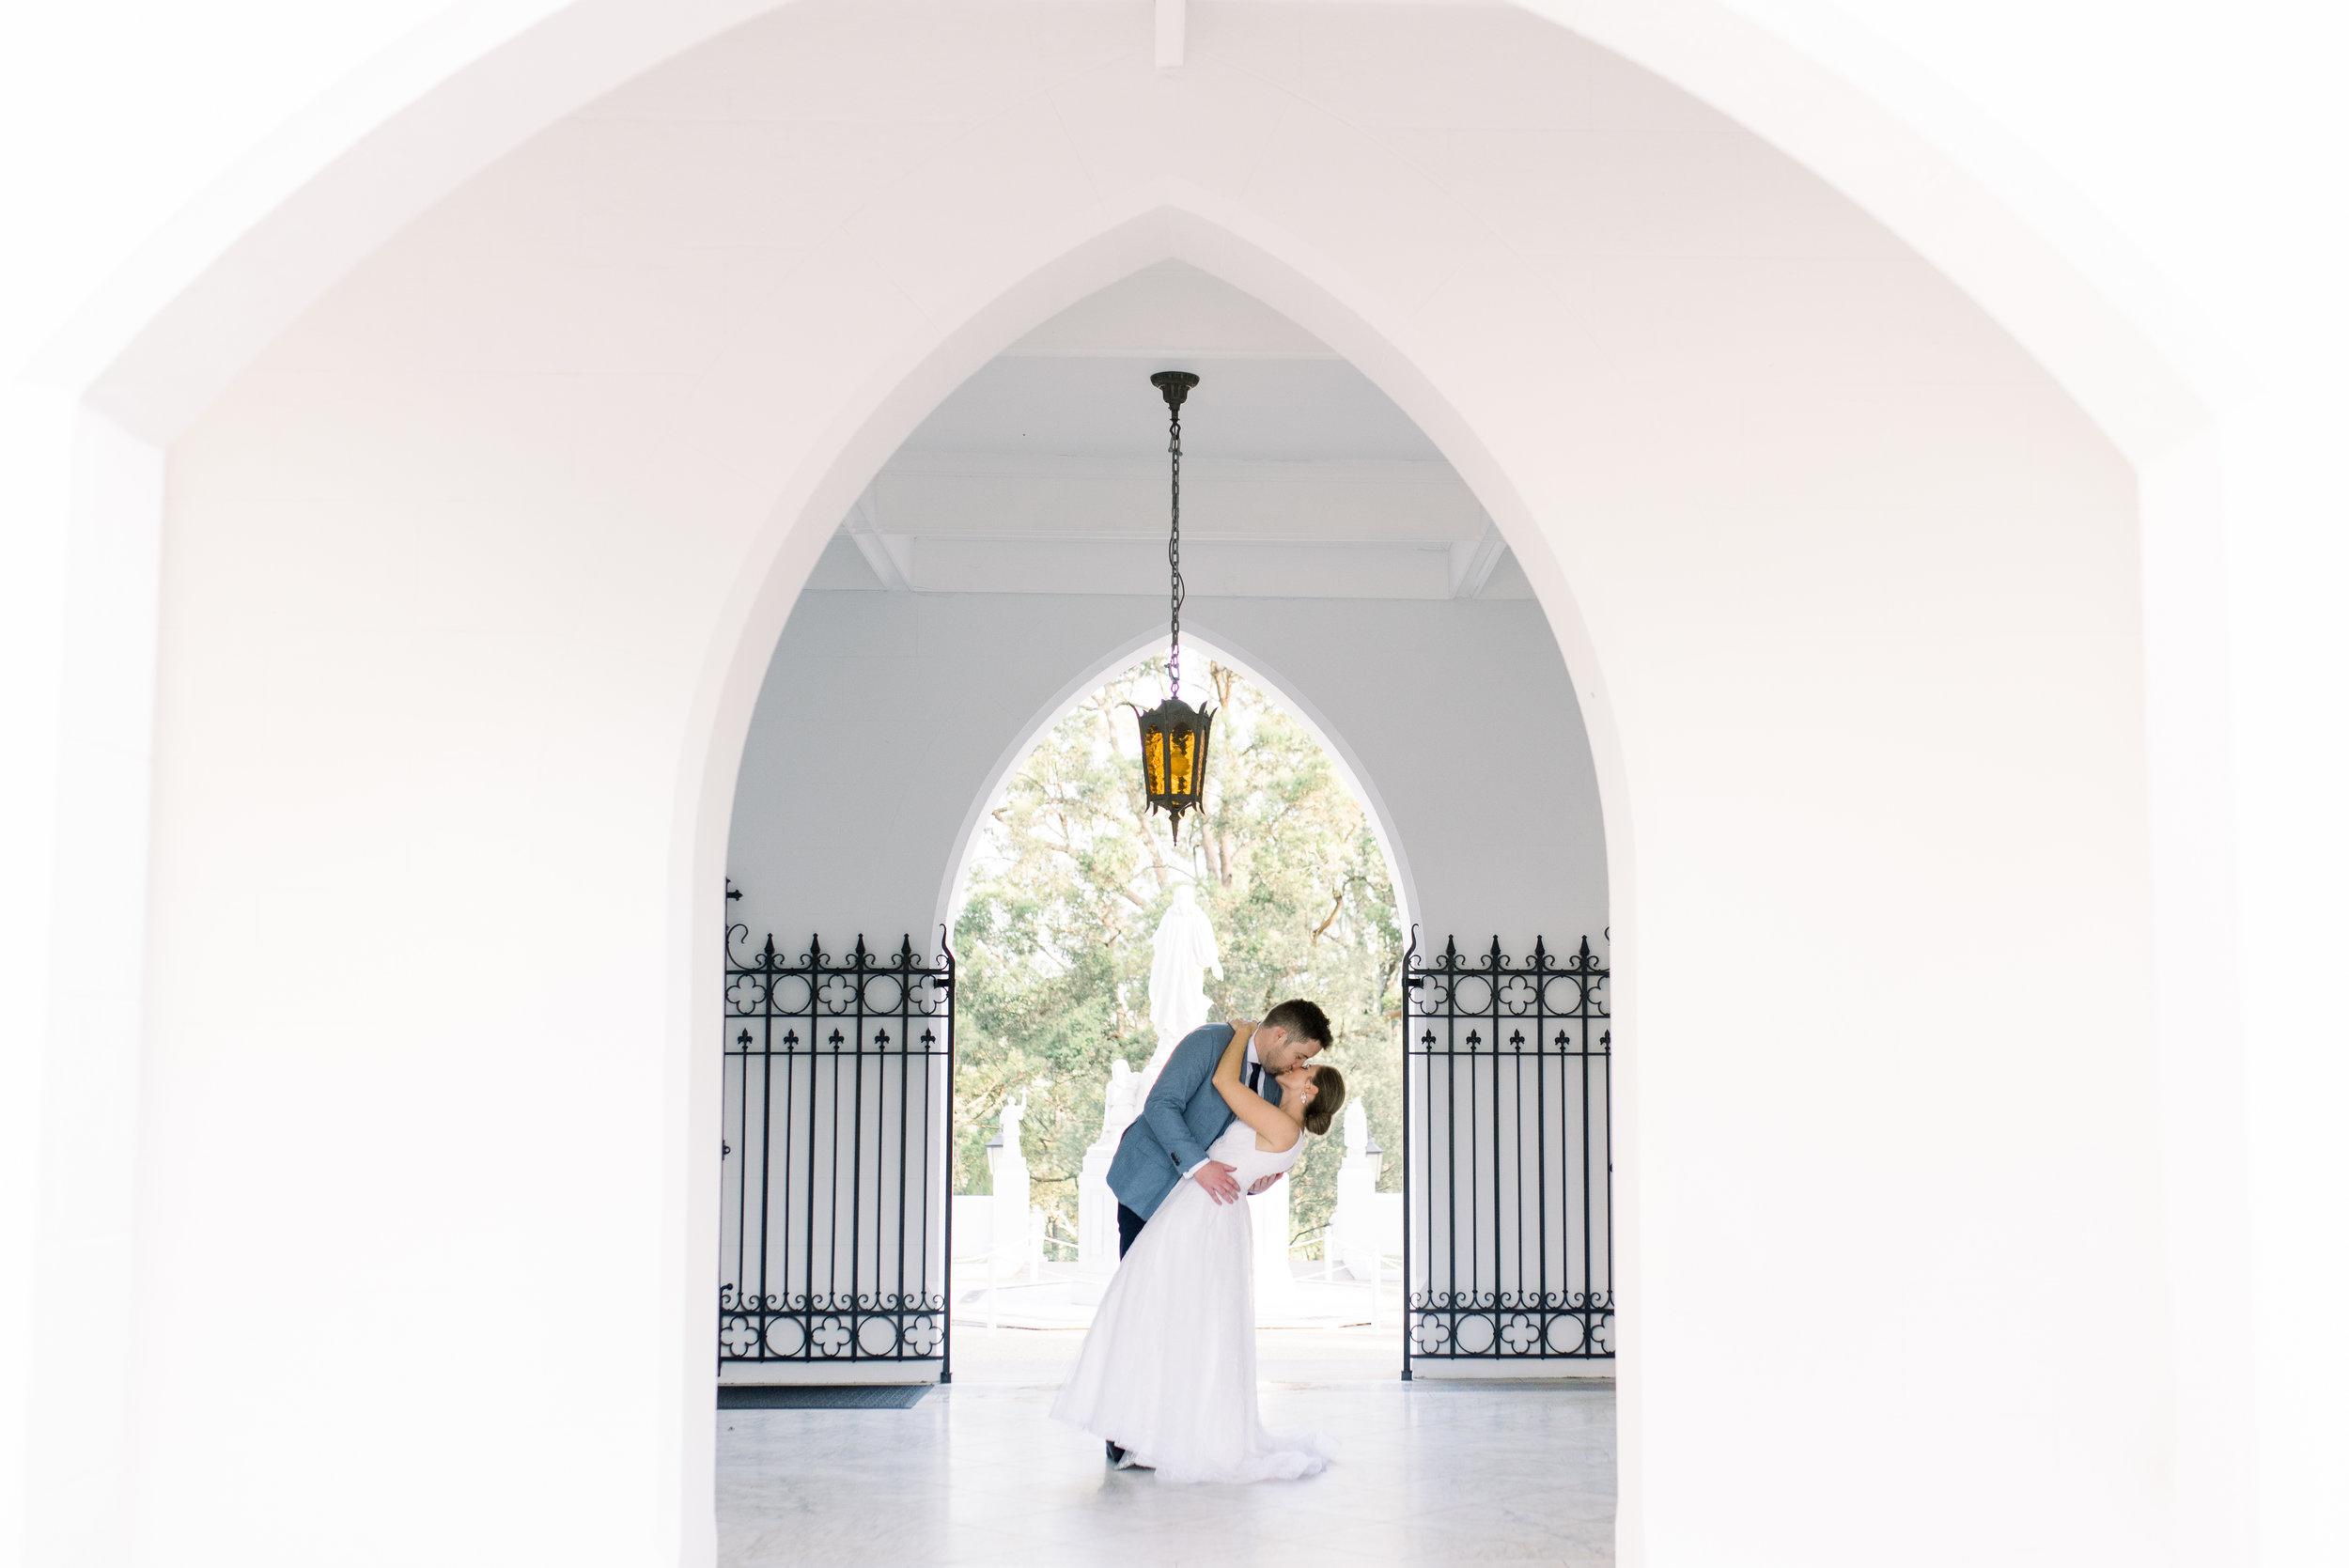 refinery-wedding-brisbane-city-wedding-photographer-60.jpg